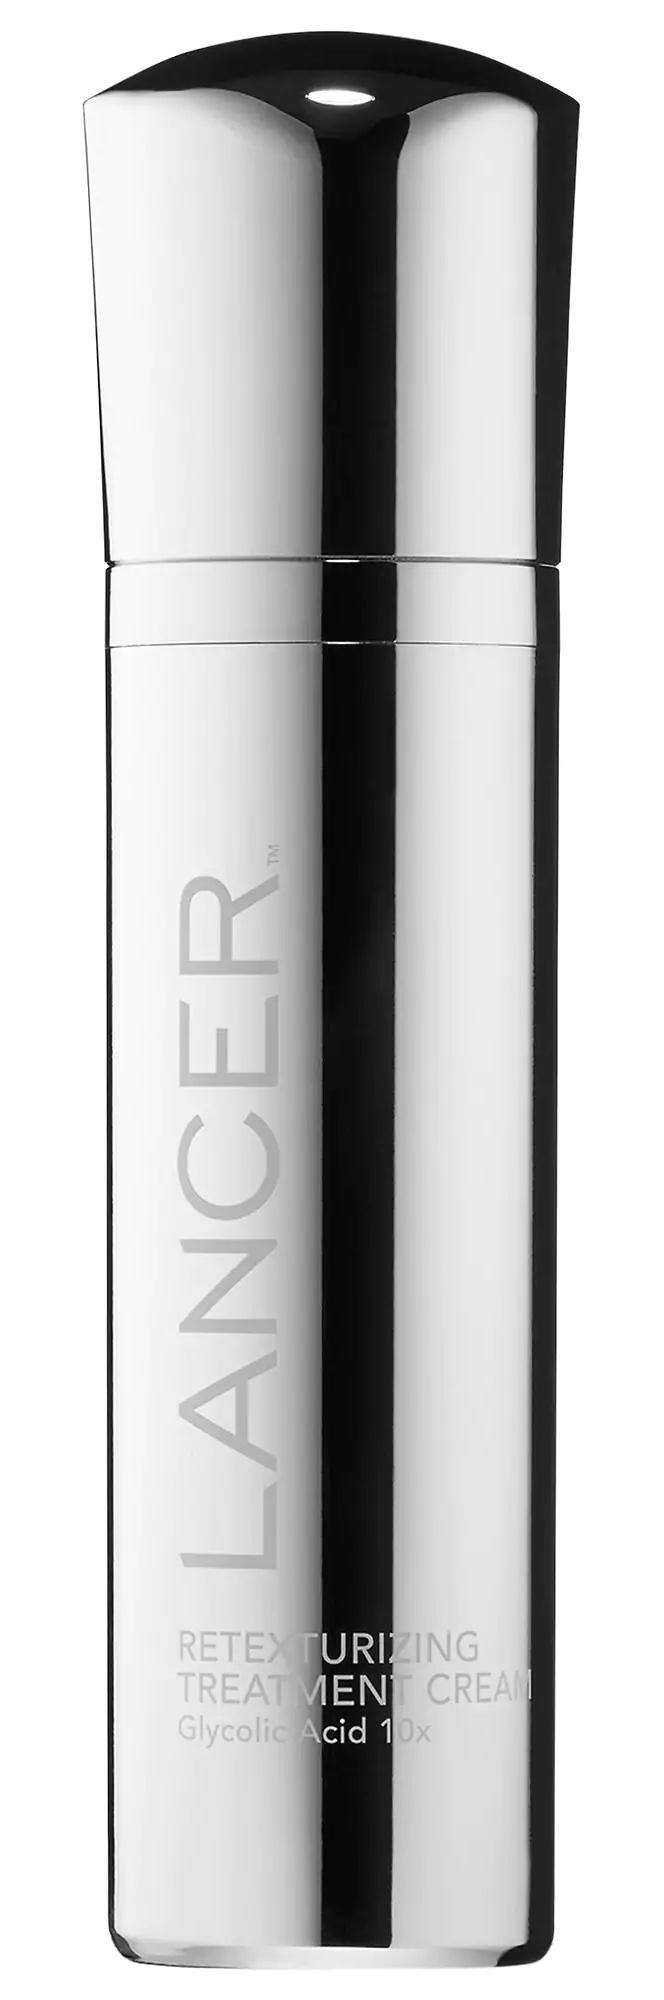 LANCER Retexturizing Treatment Cream With Glycolic Acid 10X